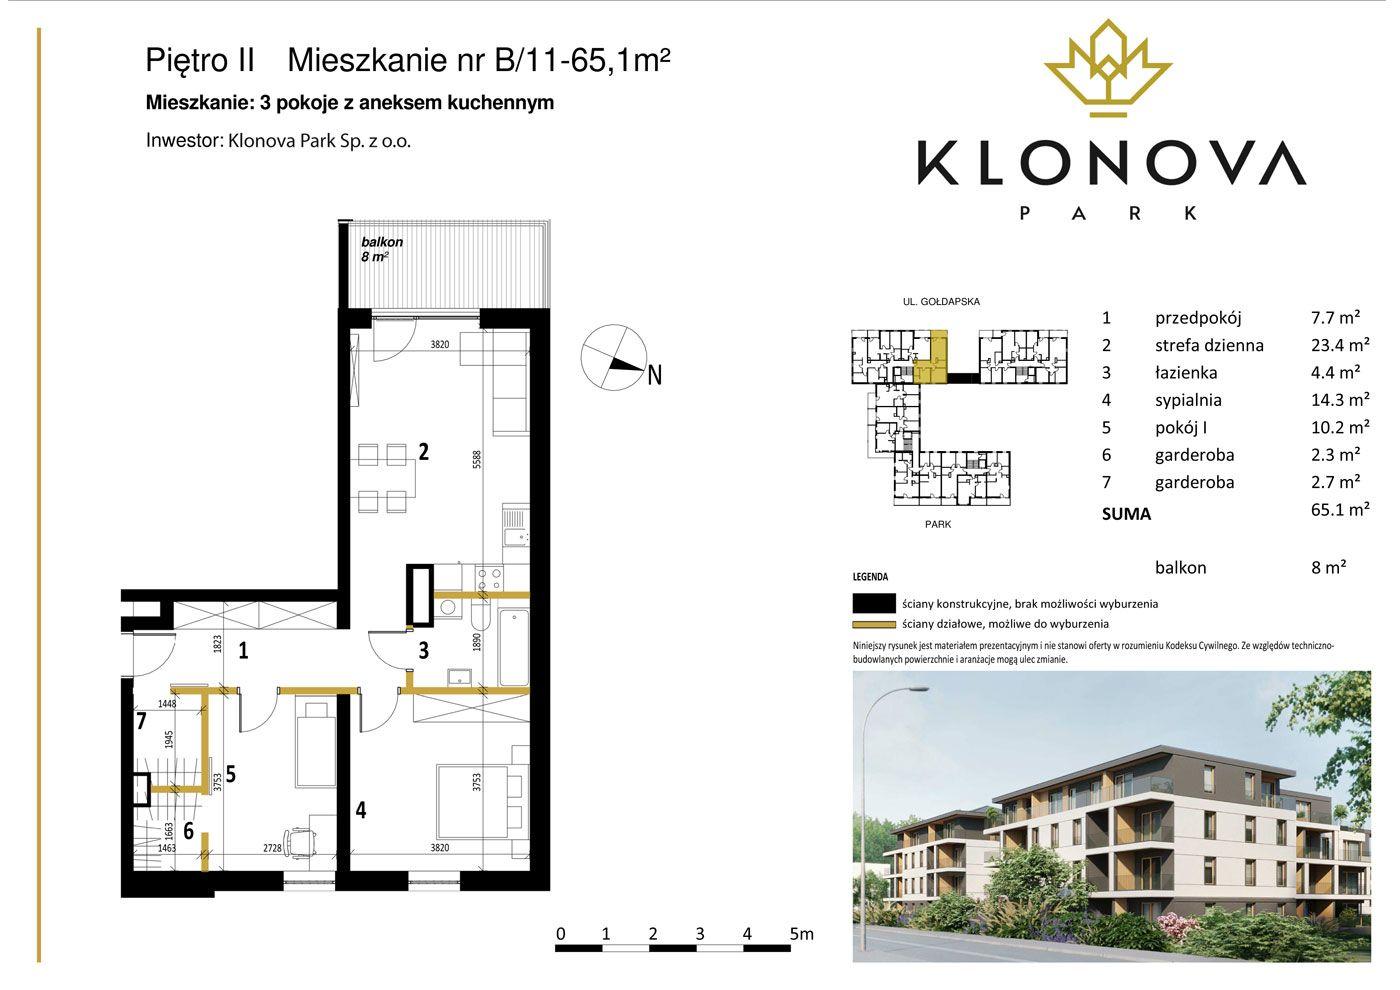 Apartamenty Klonova Park - Plan mieszkania B/11